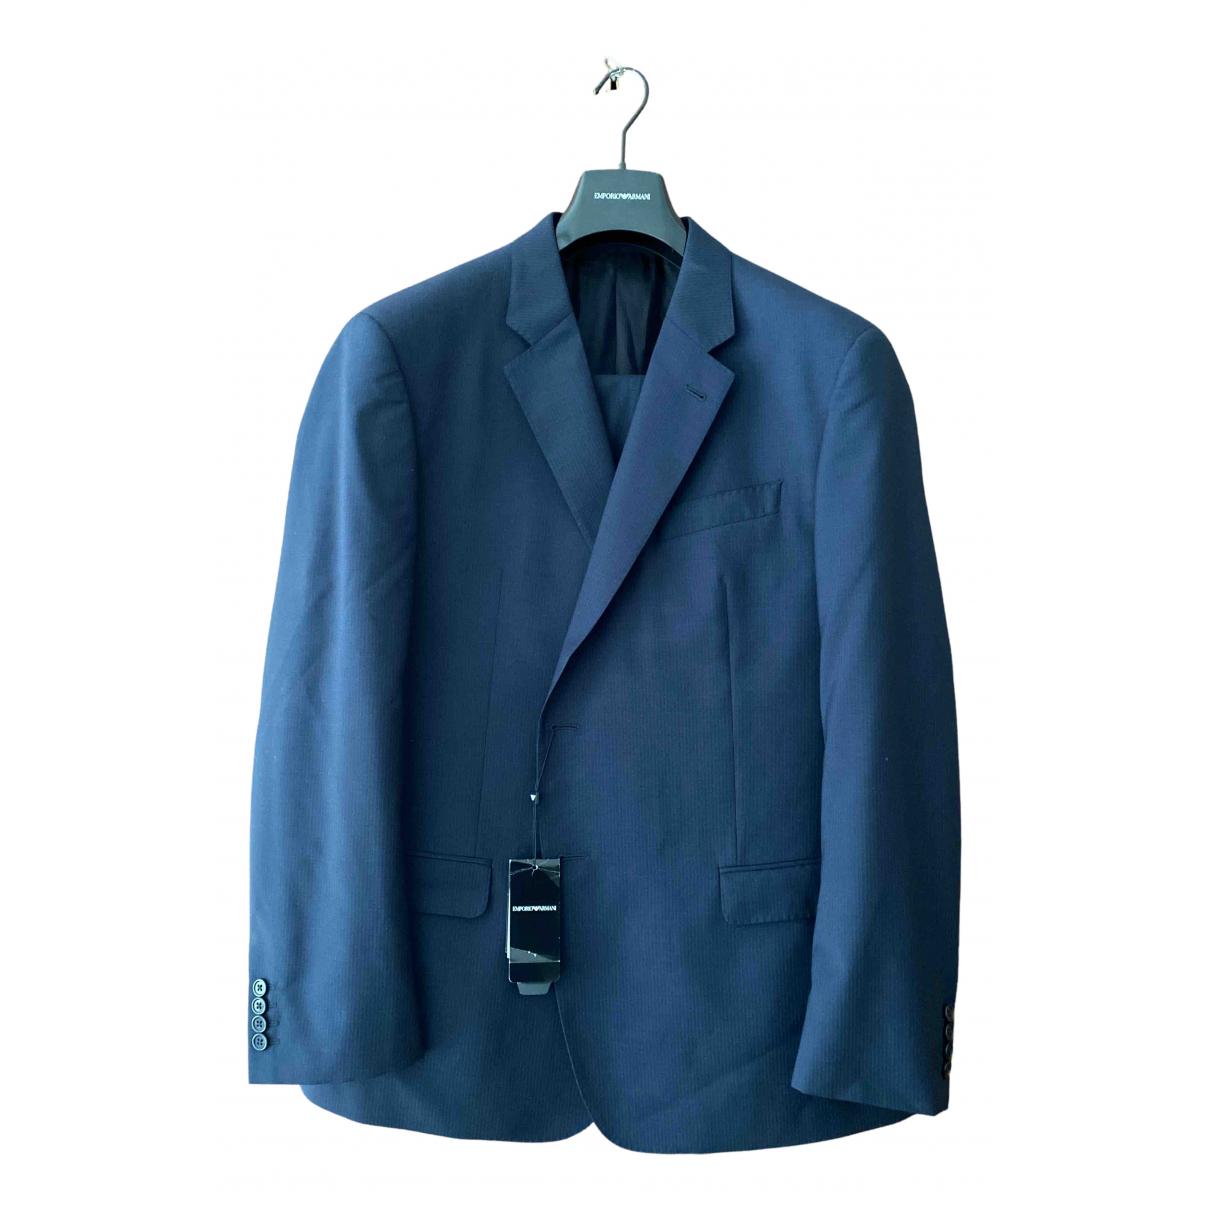 Emporio Armani N Blue Wool Suits for Men XXXL International